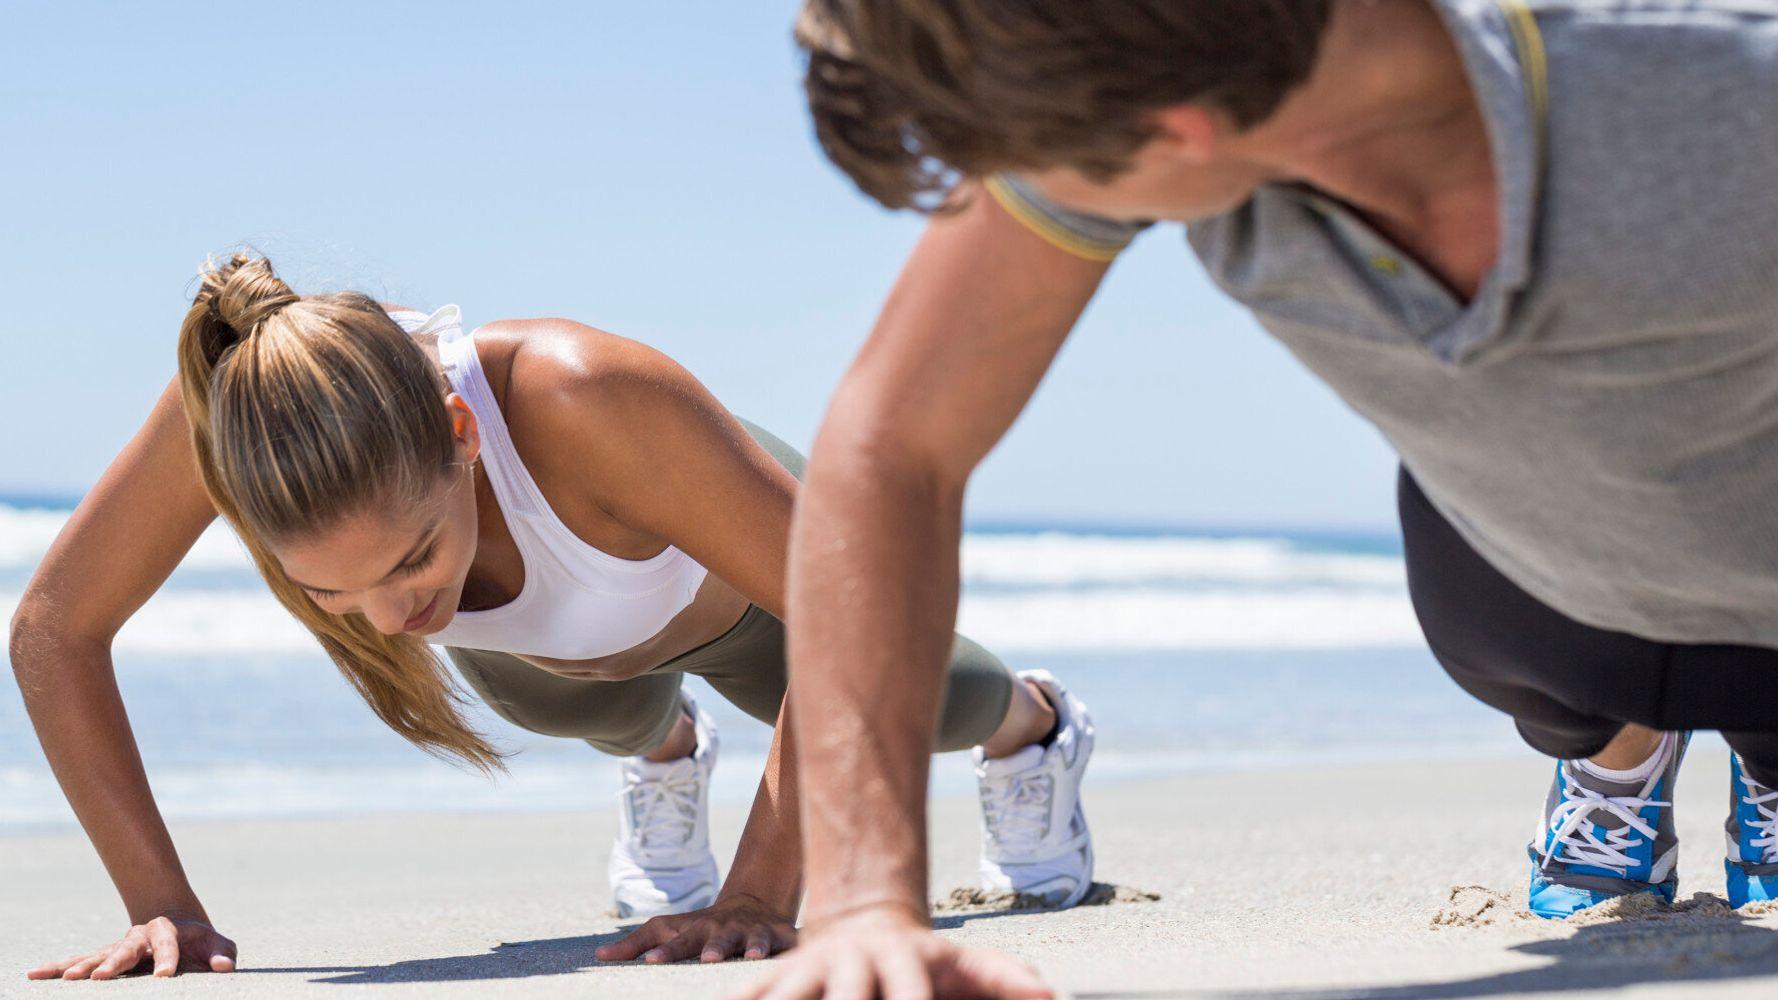 Do Push-Ups Build Your Arms? | HuffPost Life